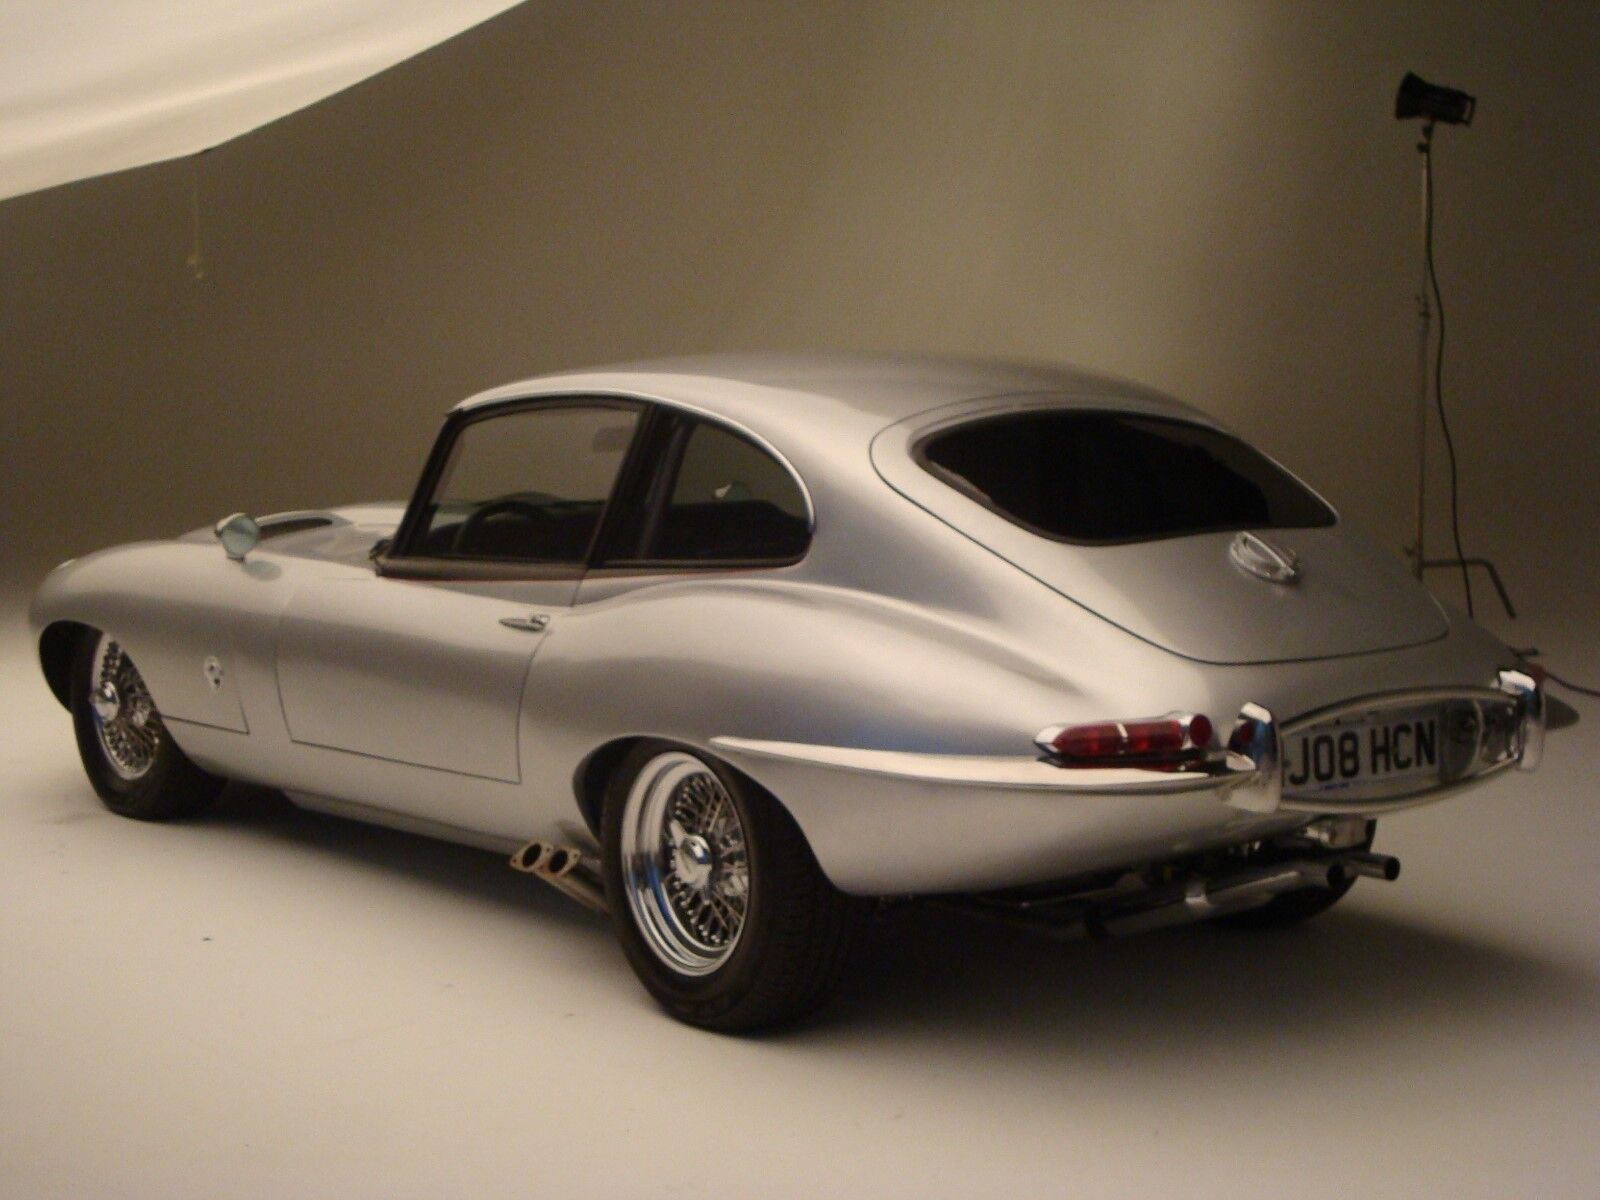 1969 Jaguar E-Type coupe 1969 XKE Etype 2+2